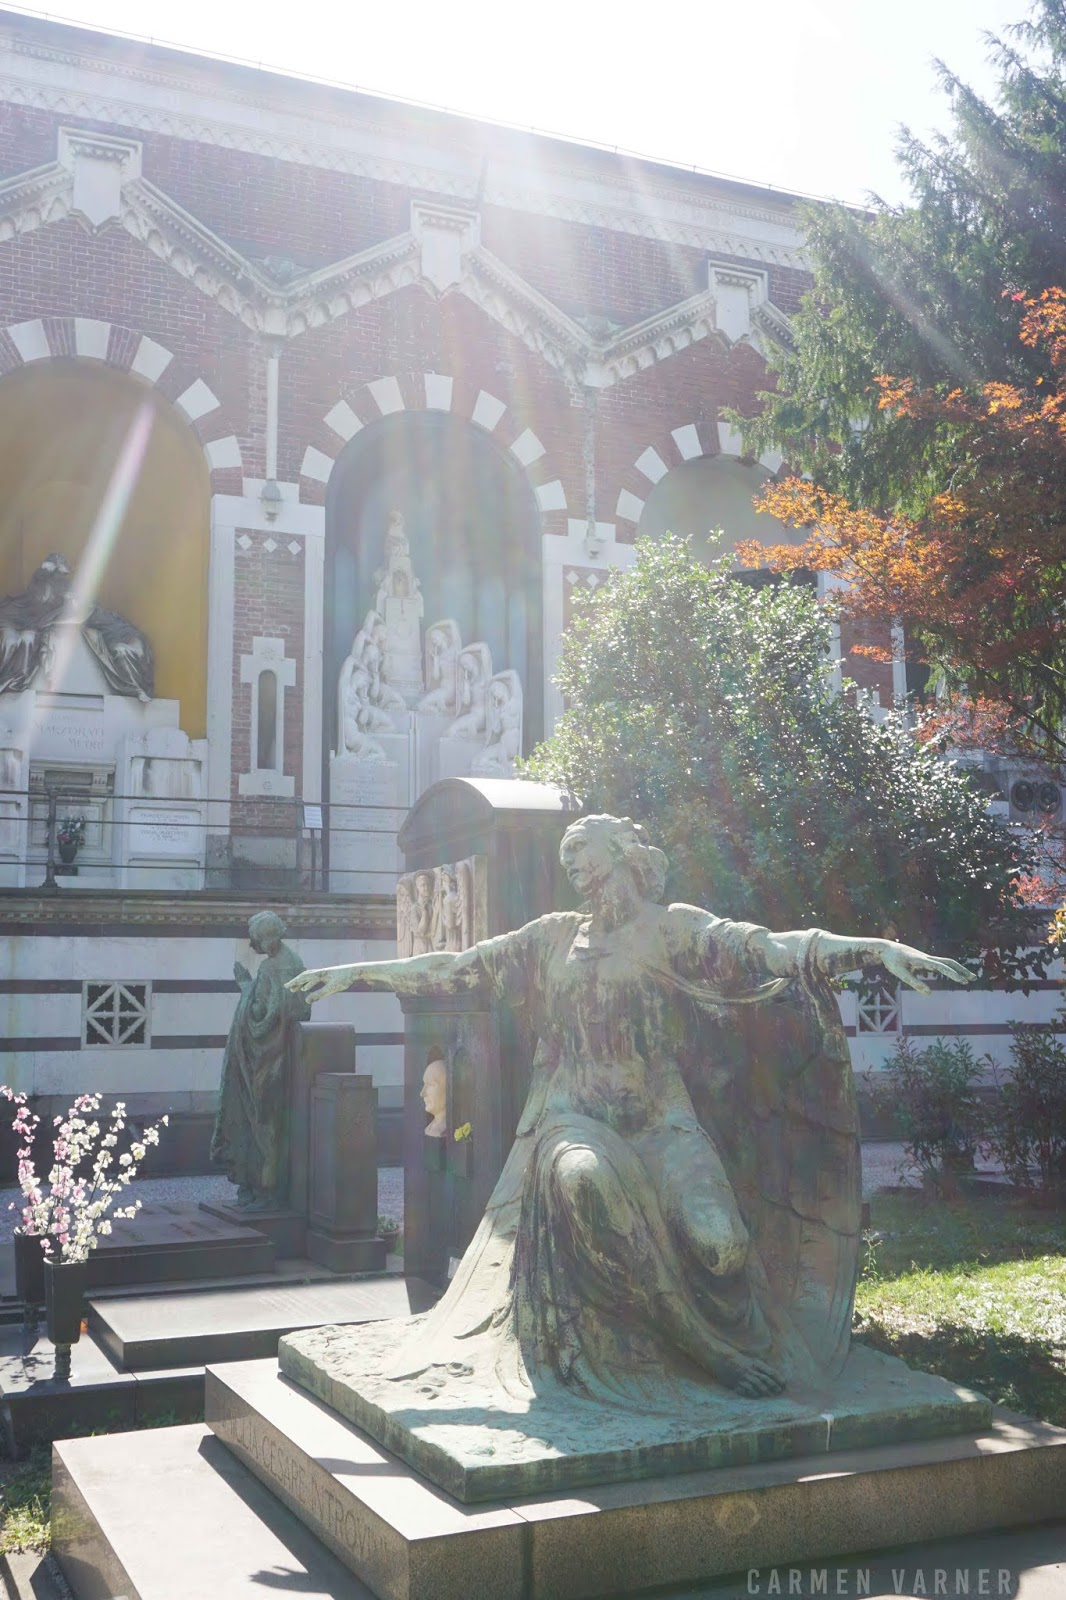 A sculpture at Cimitero Monumentale di Milano (Milan Monumental Cemetery)